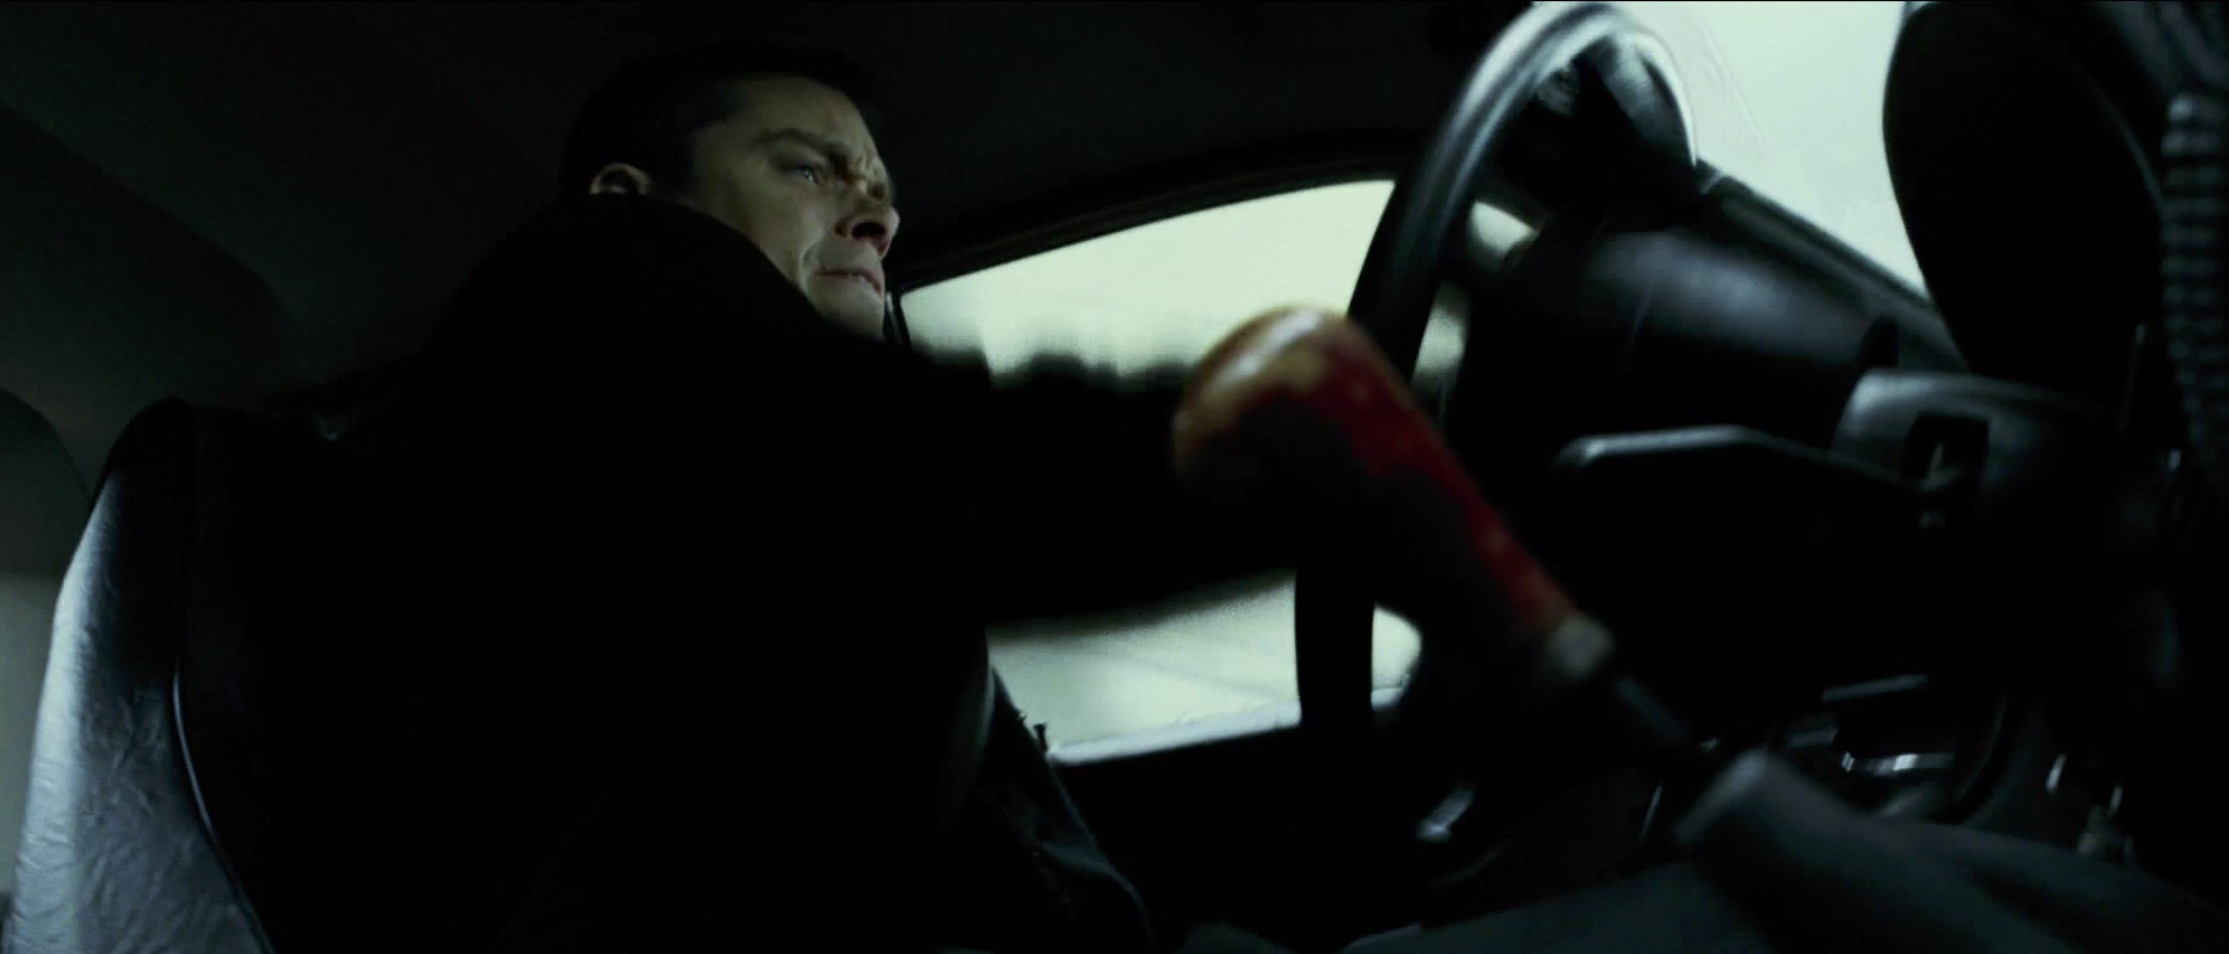 Jason Bourne Shifting gears taxi